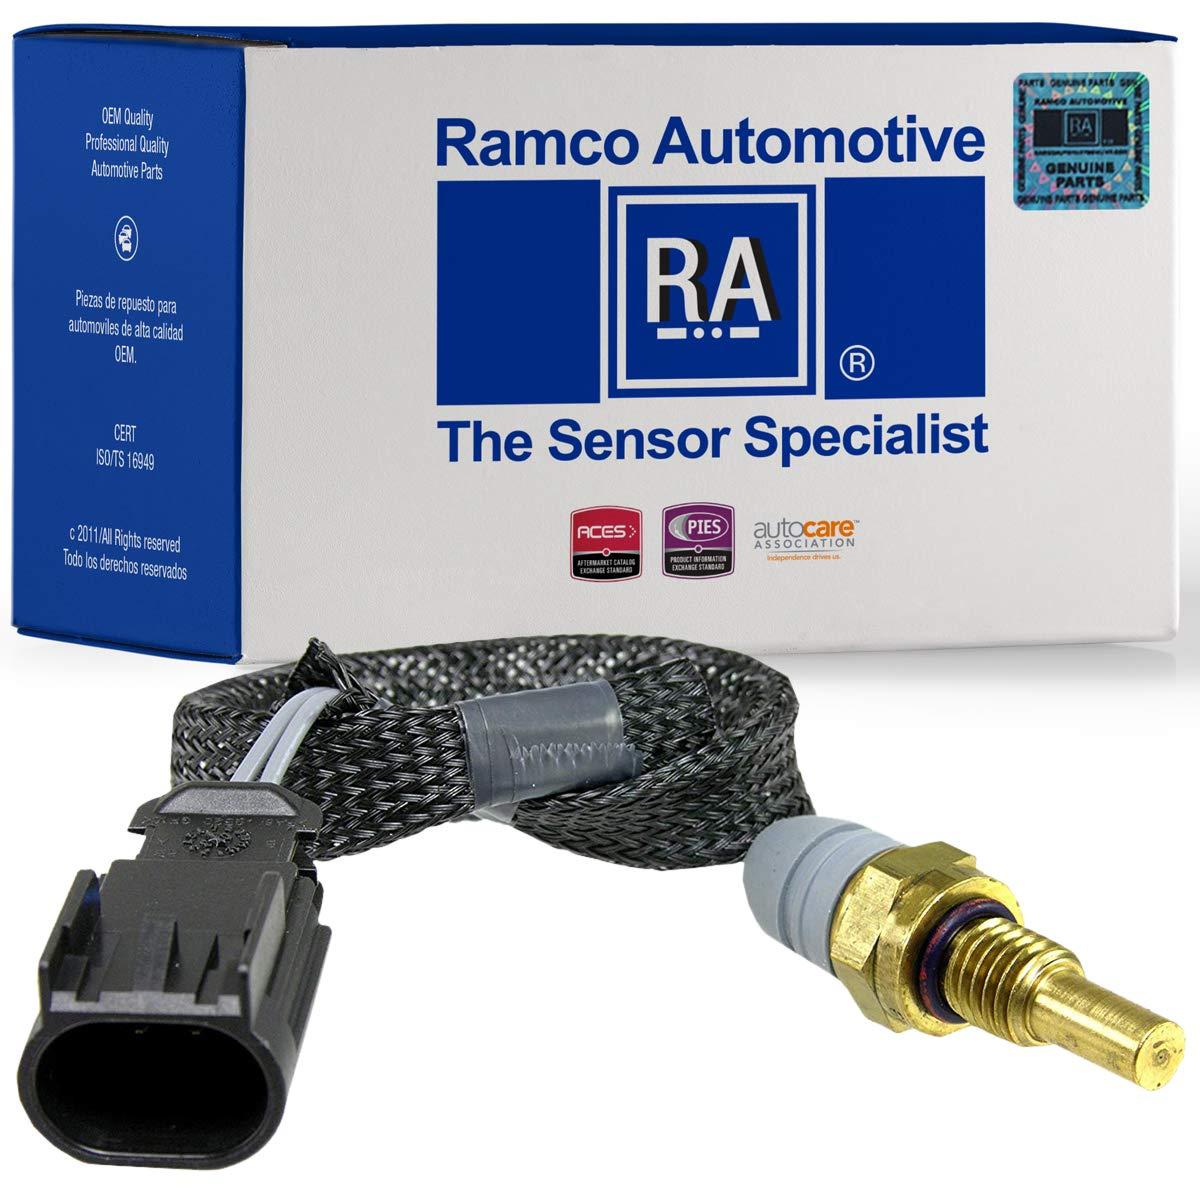 Coolant Temperature Sensor For 12583127 12586299 12590959 12601050 12606657